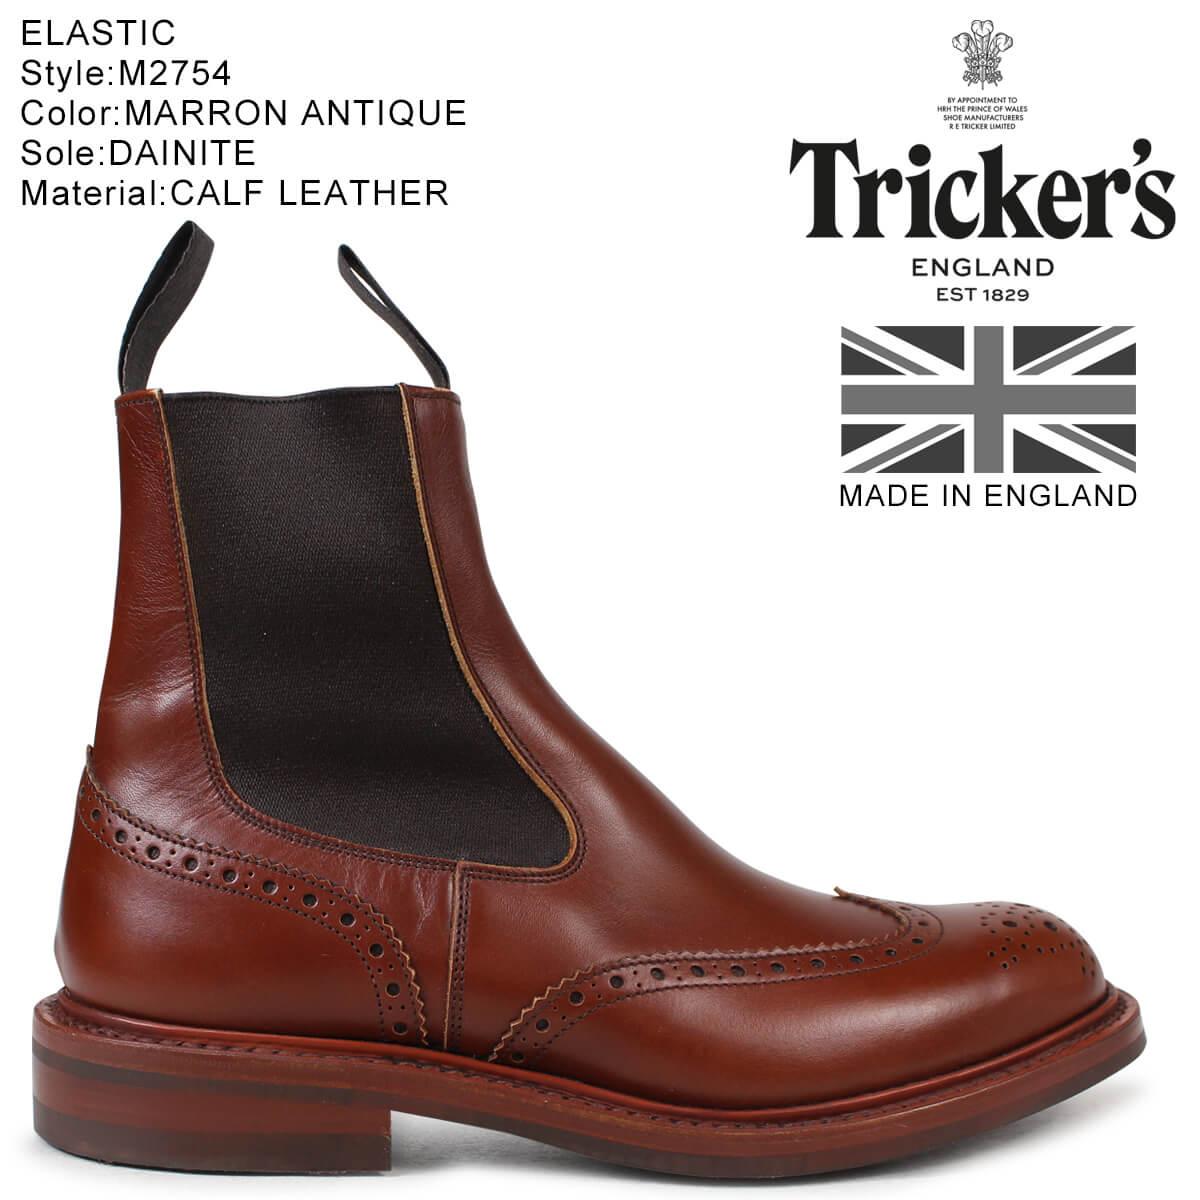 Trickers トリッカーズ サイドゴアブーツ ELASTIC M2754 5ワイズ メンズ